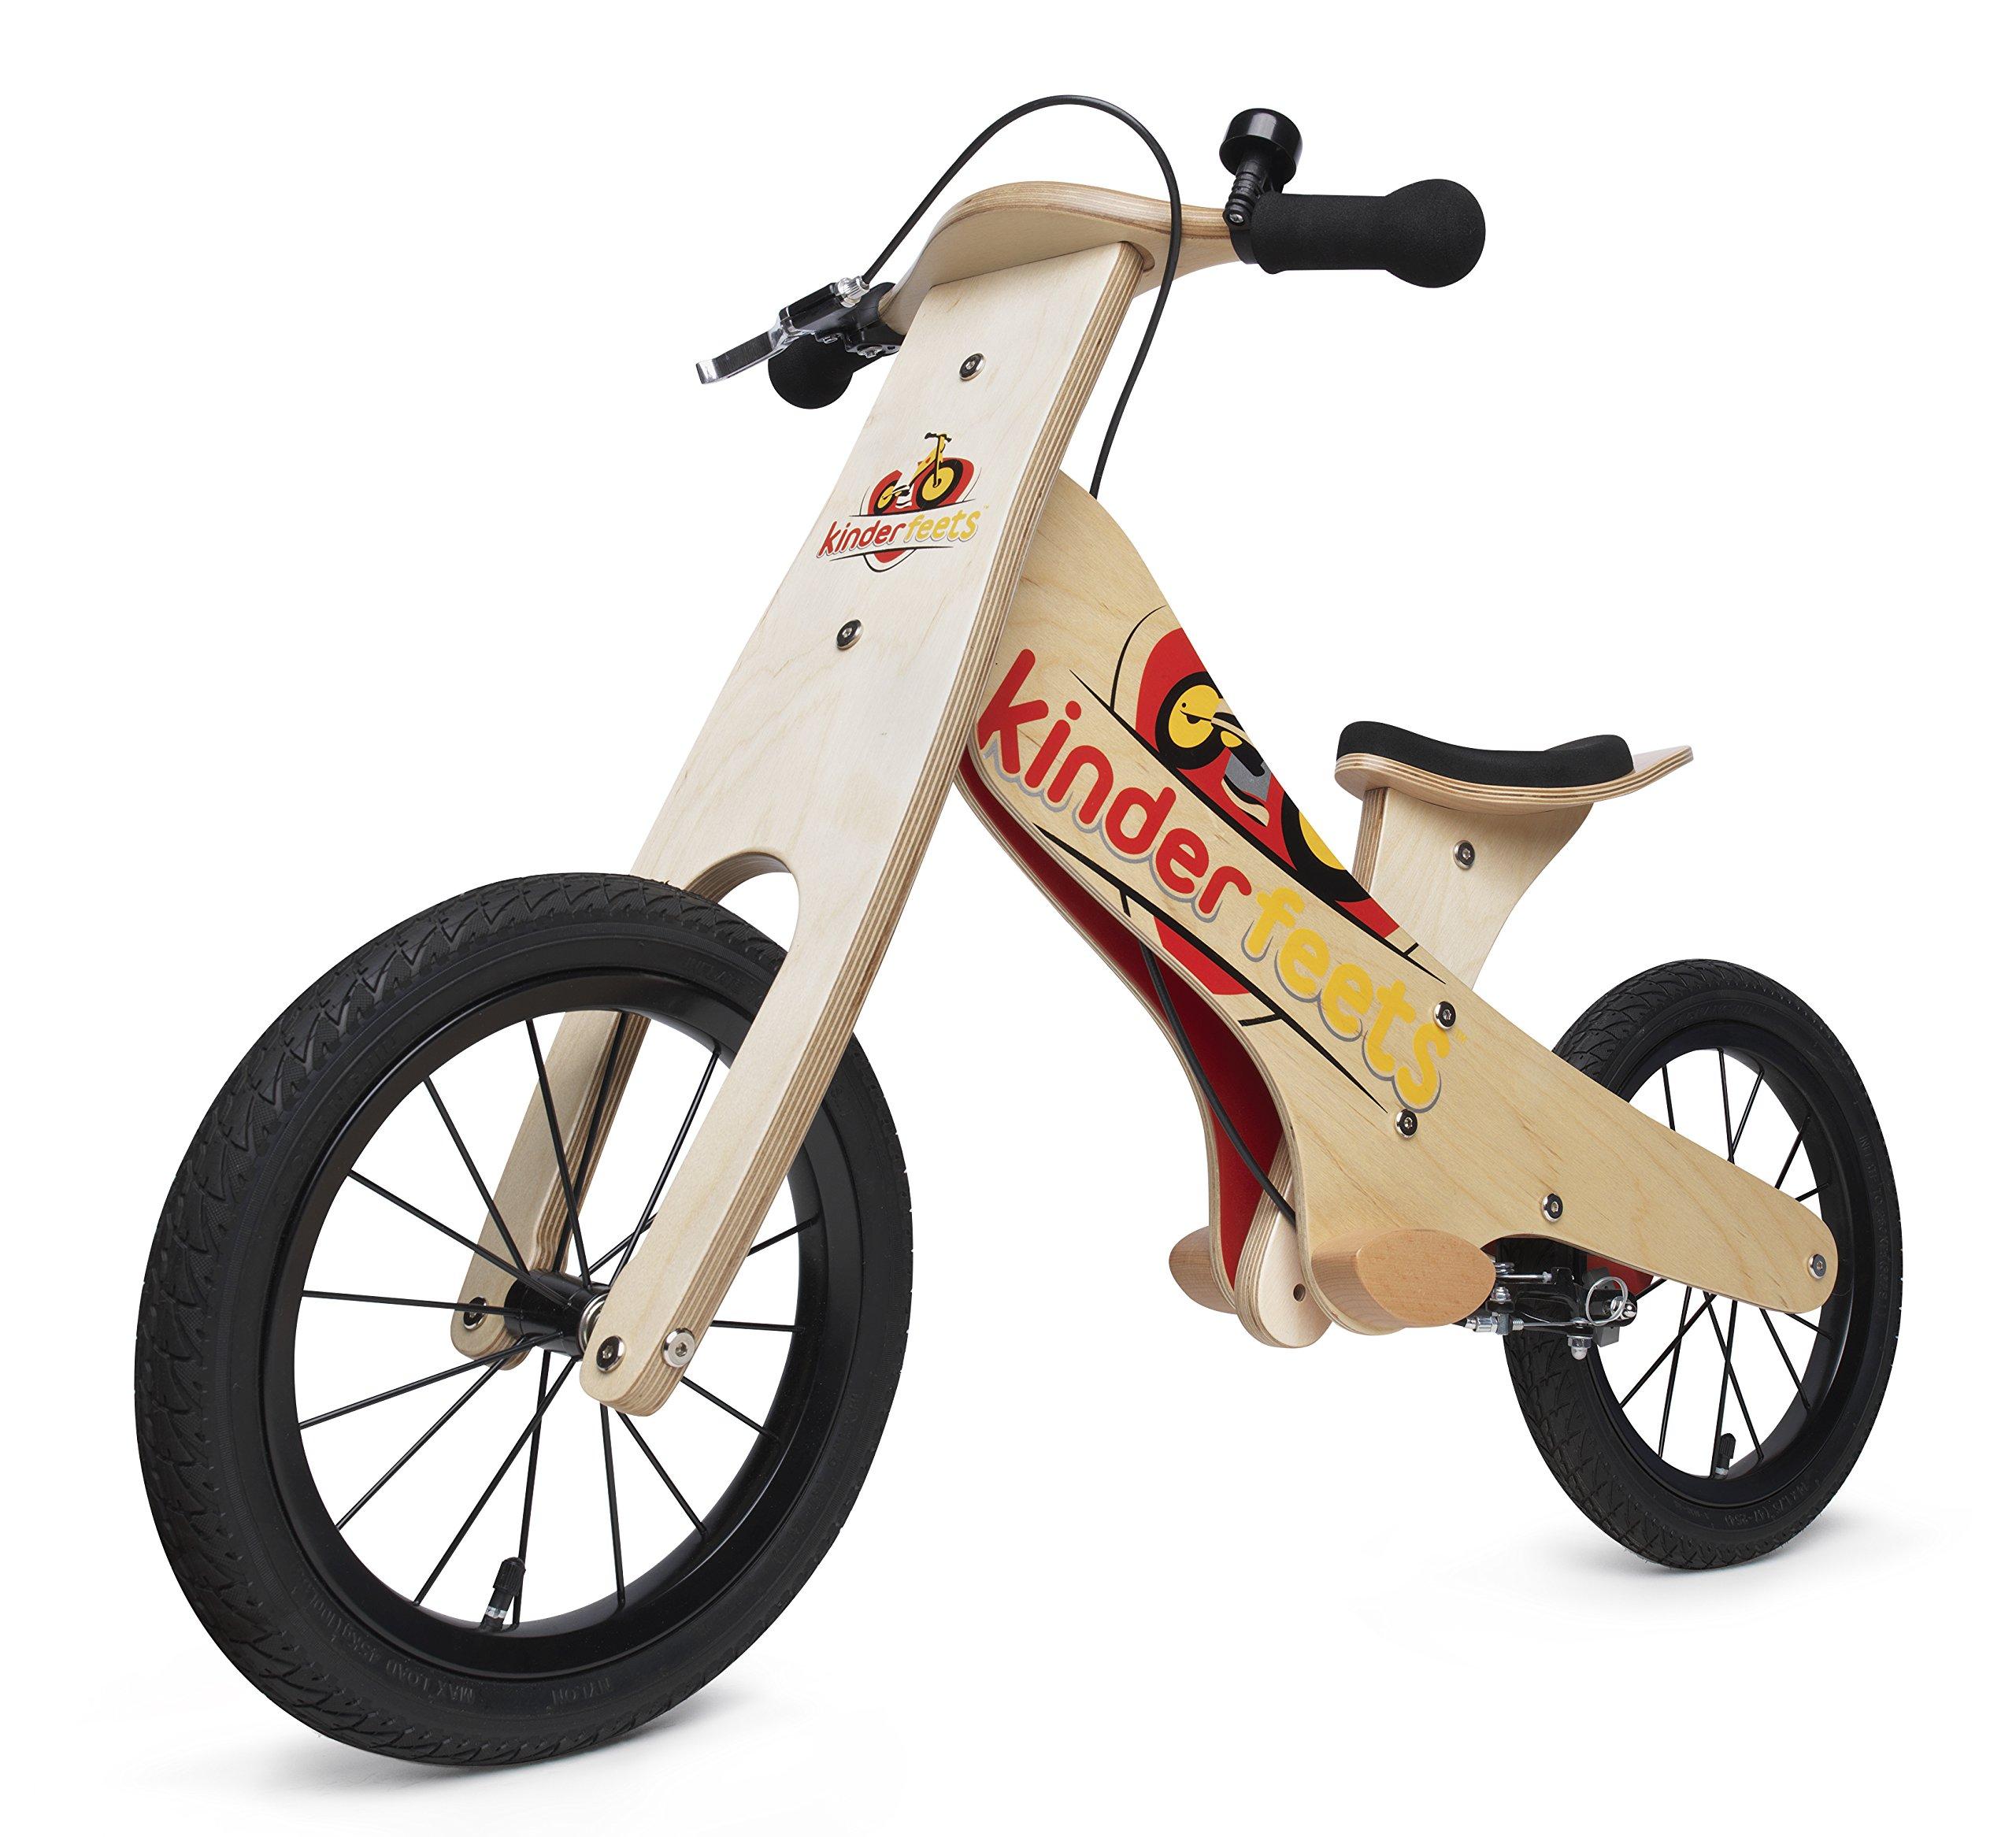 Kinderfeets Super Wooden Balance Bike by Kinderfeets (Image #2)